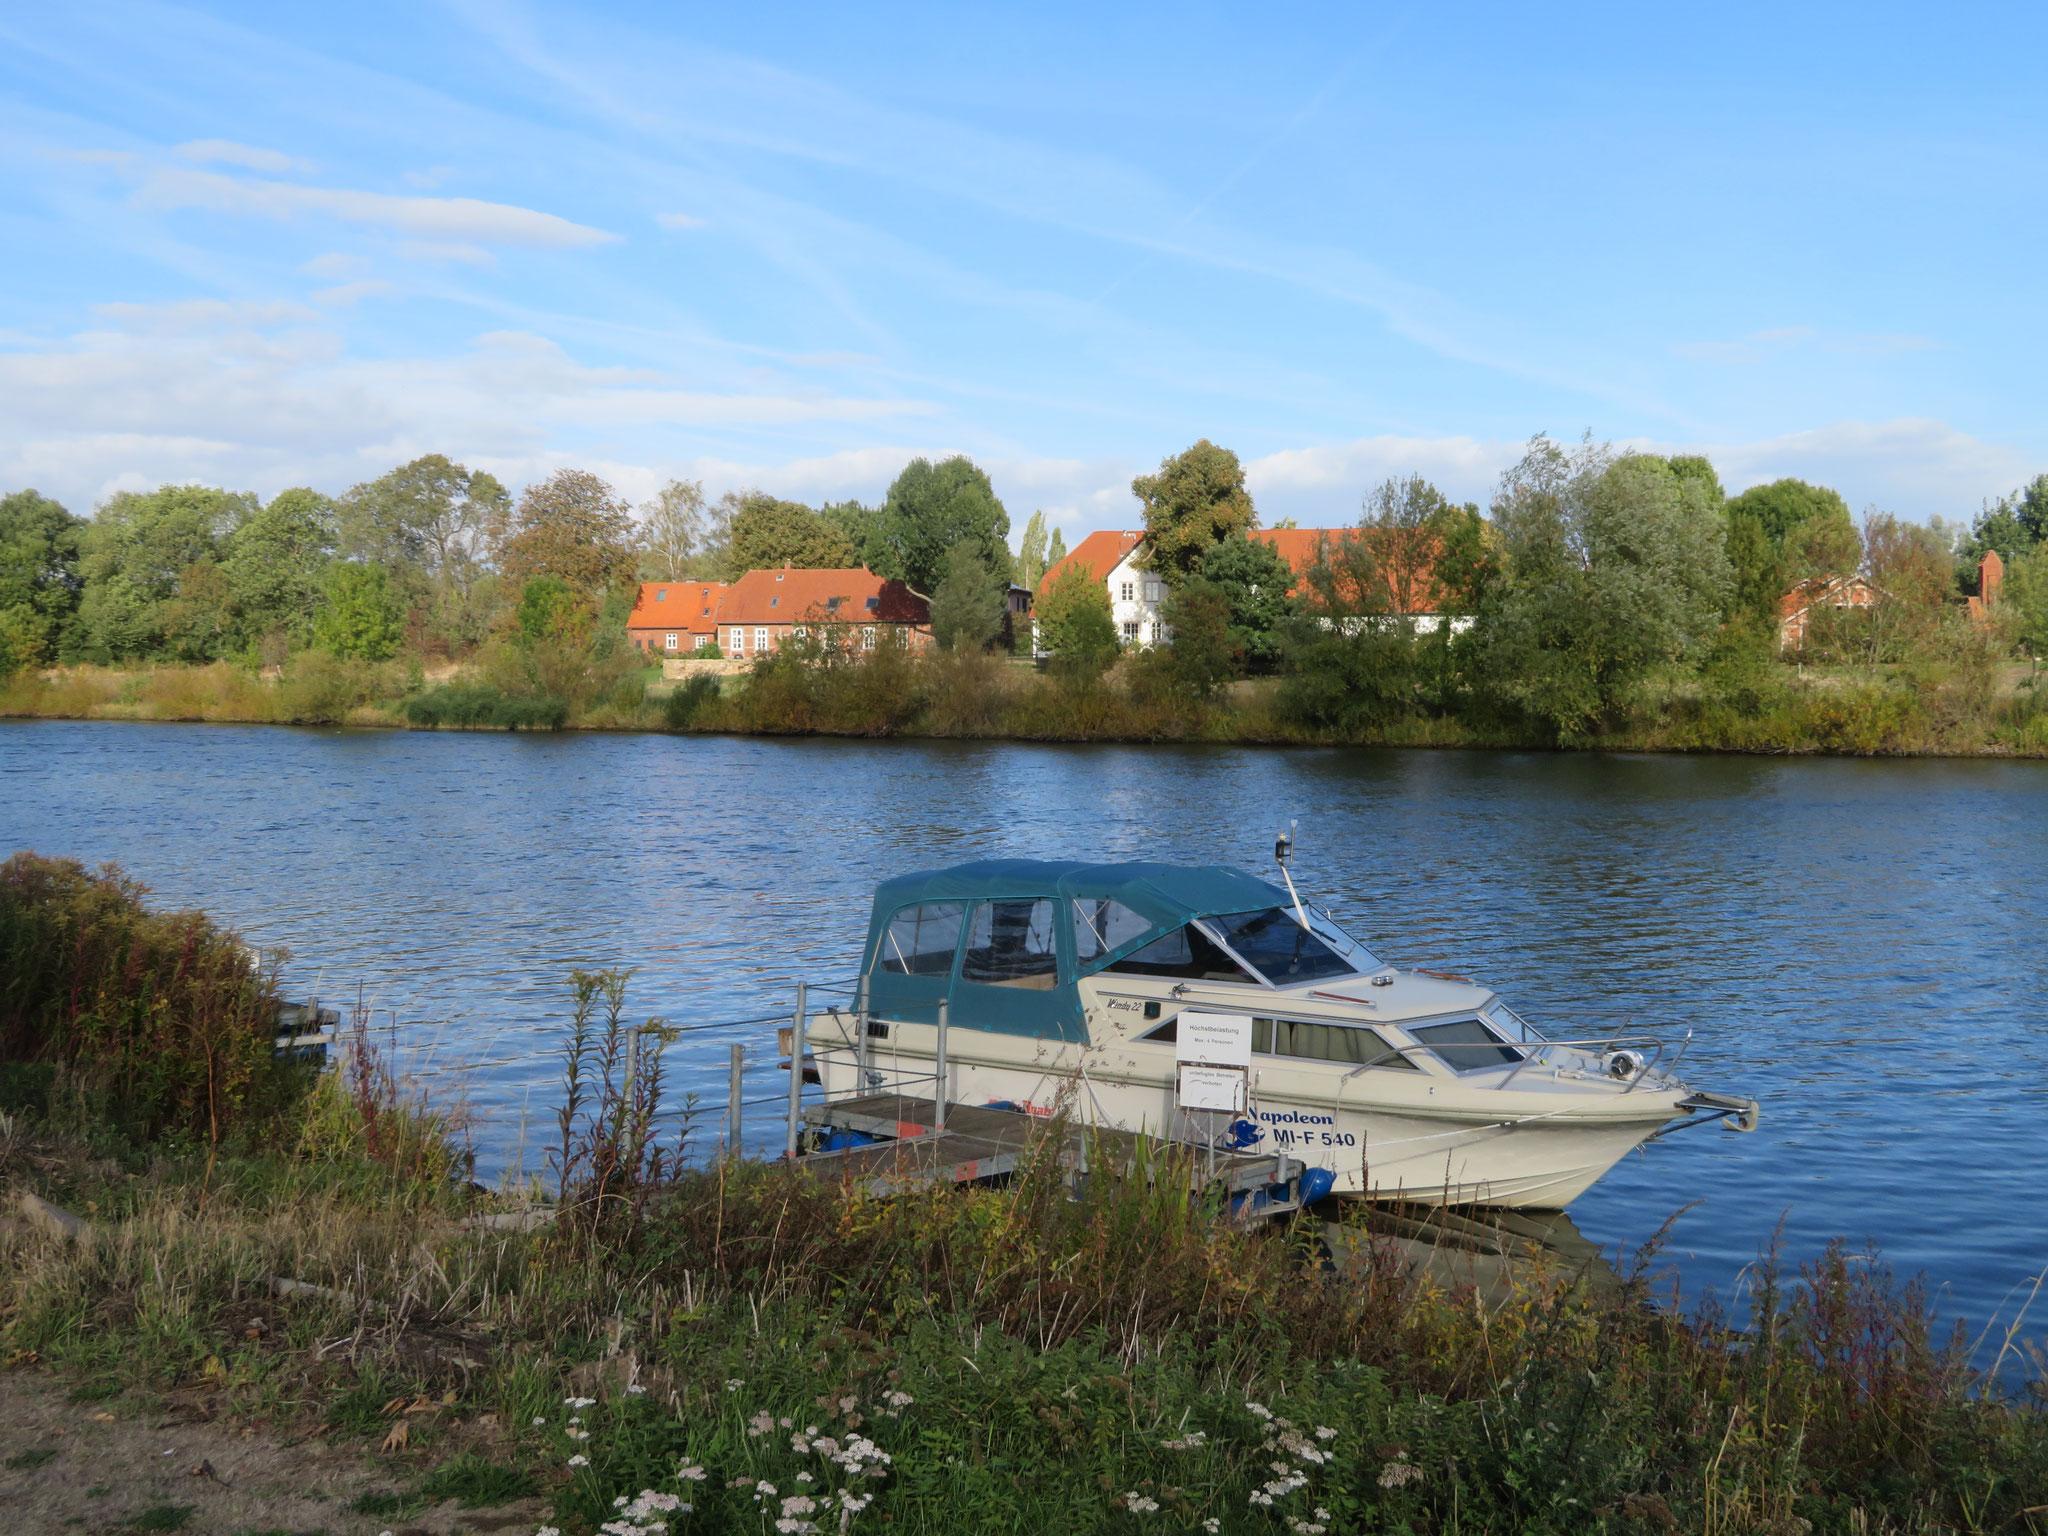 Stolzenau an der Weser